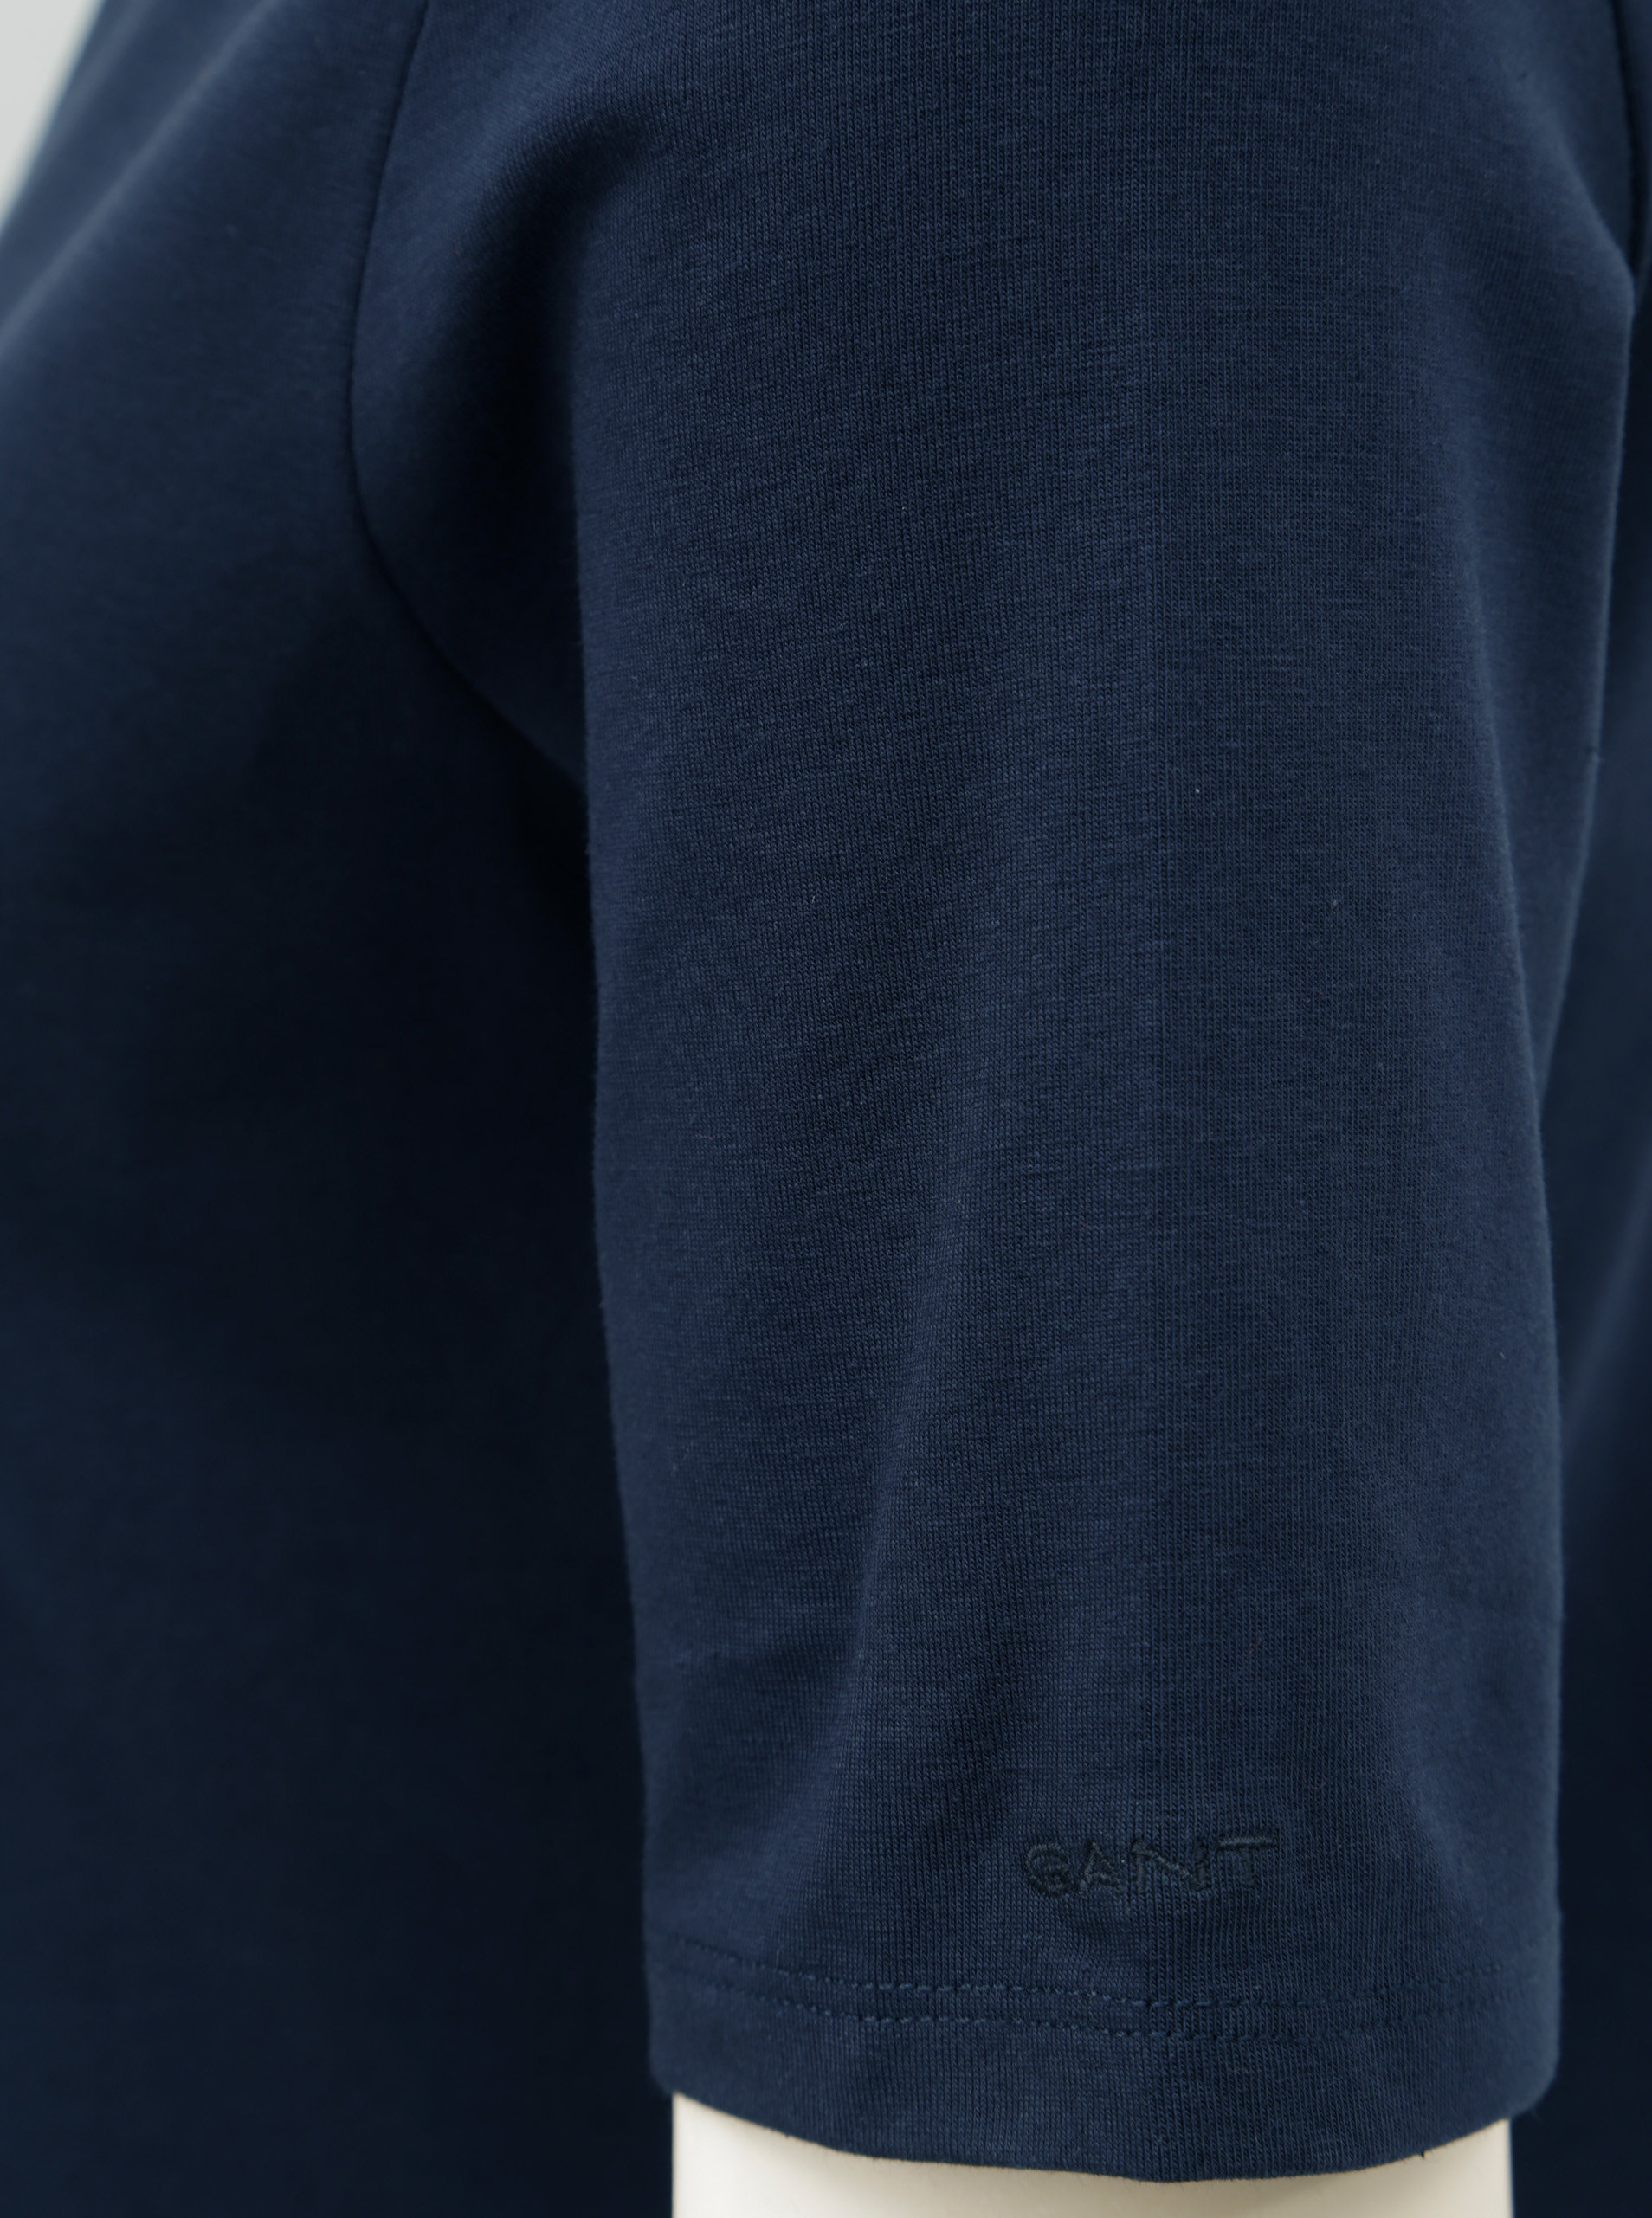 5e4c261f3f4a Tmavomodré dámske tričko s lodičkovým výstrihom GANT ...